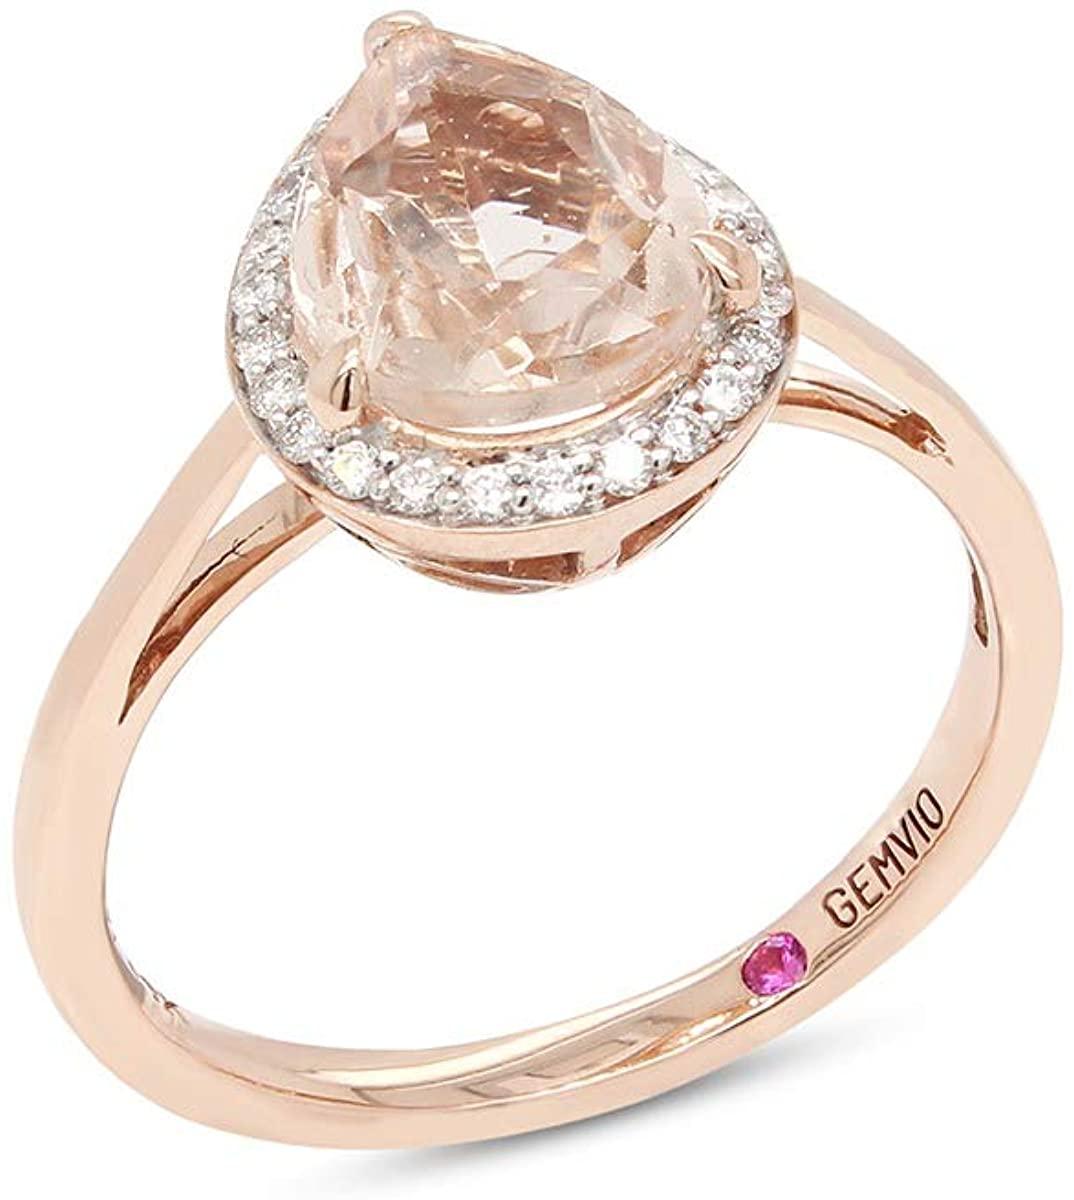 GEMVIO Collection Blush Pear Cut 7X9MM Morganite Teardrop Halo Solitaire Gemstone & Diamond in 14k Gold Engagement Promise Statement Anniversary Wedding Ring